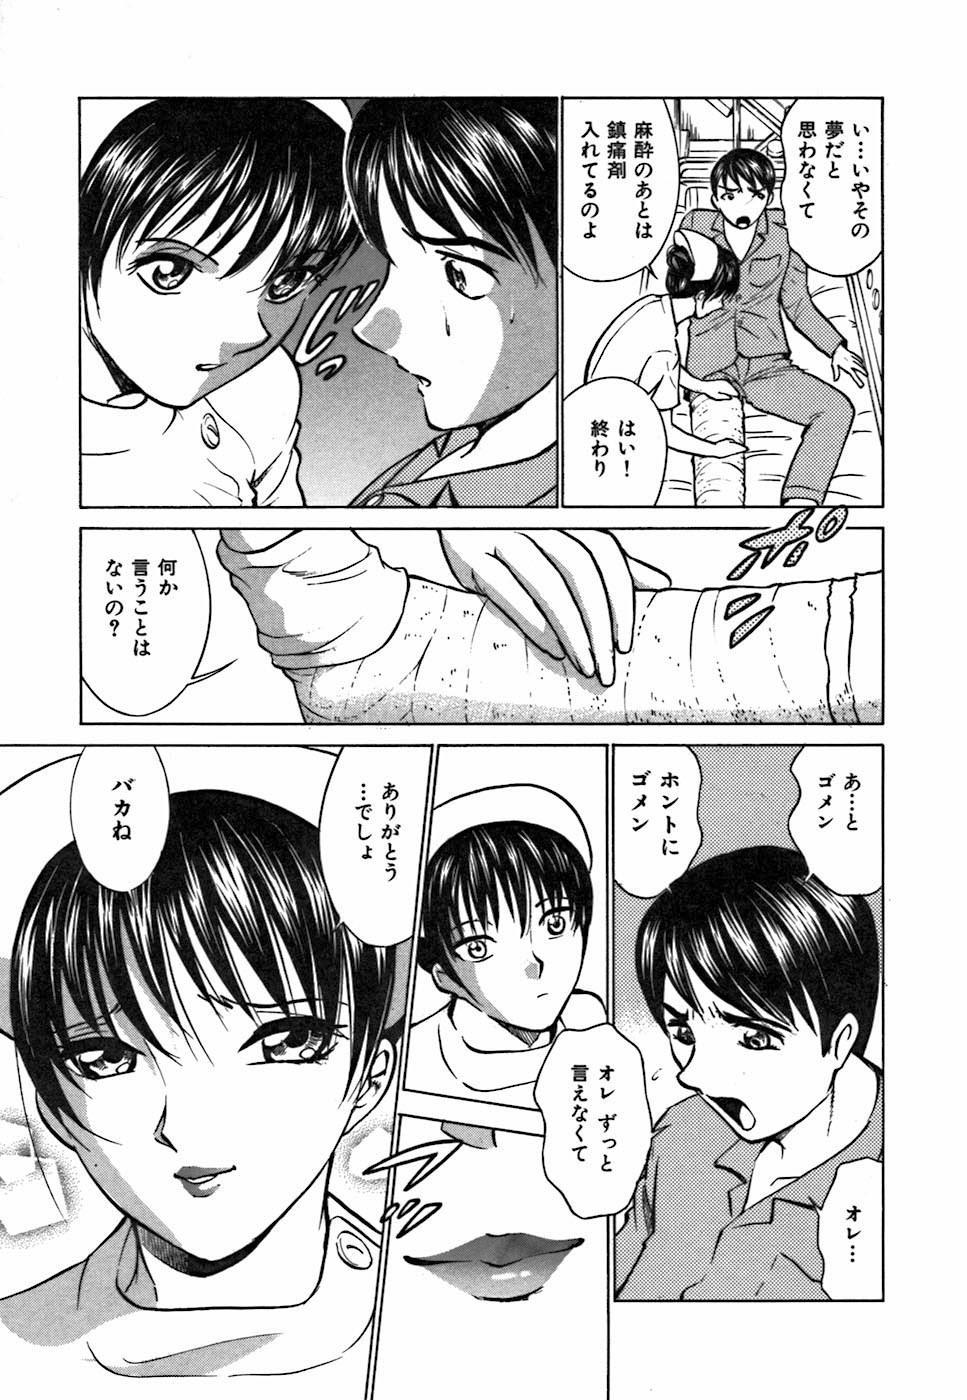 Kimi ga Nozomu Katachi | Appearance for which you hope 32